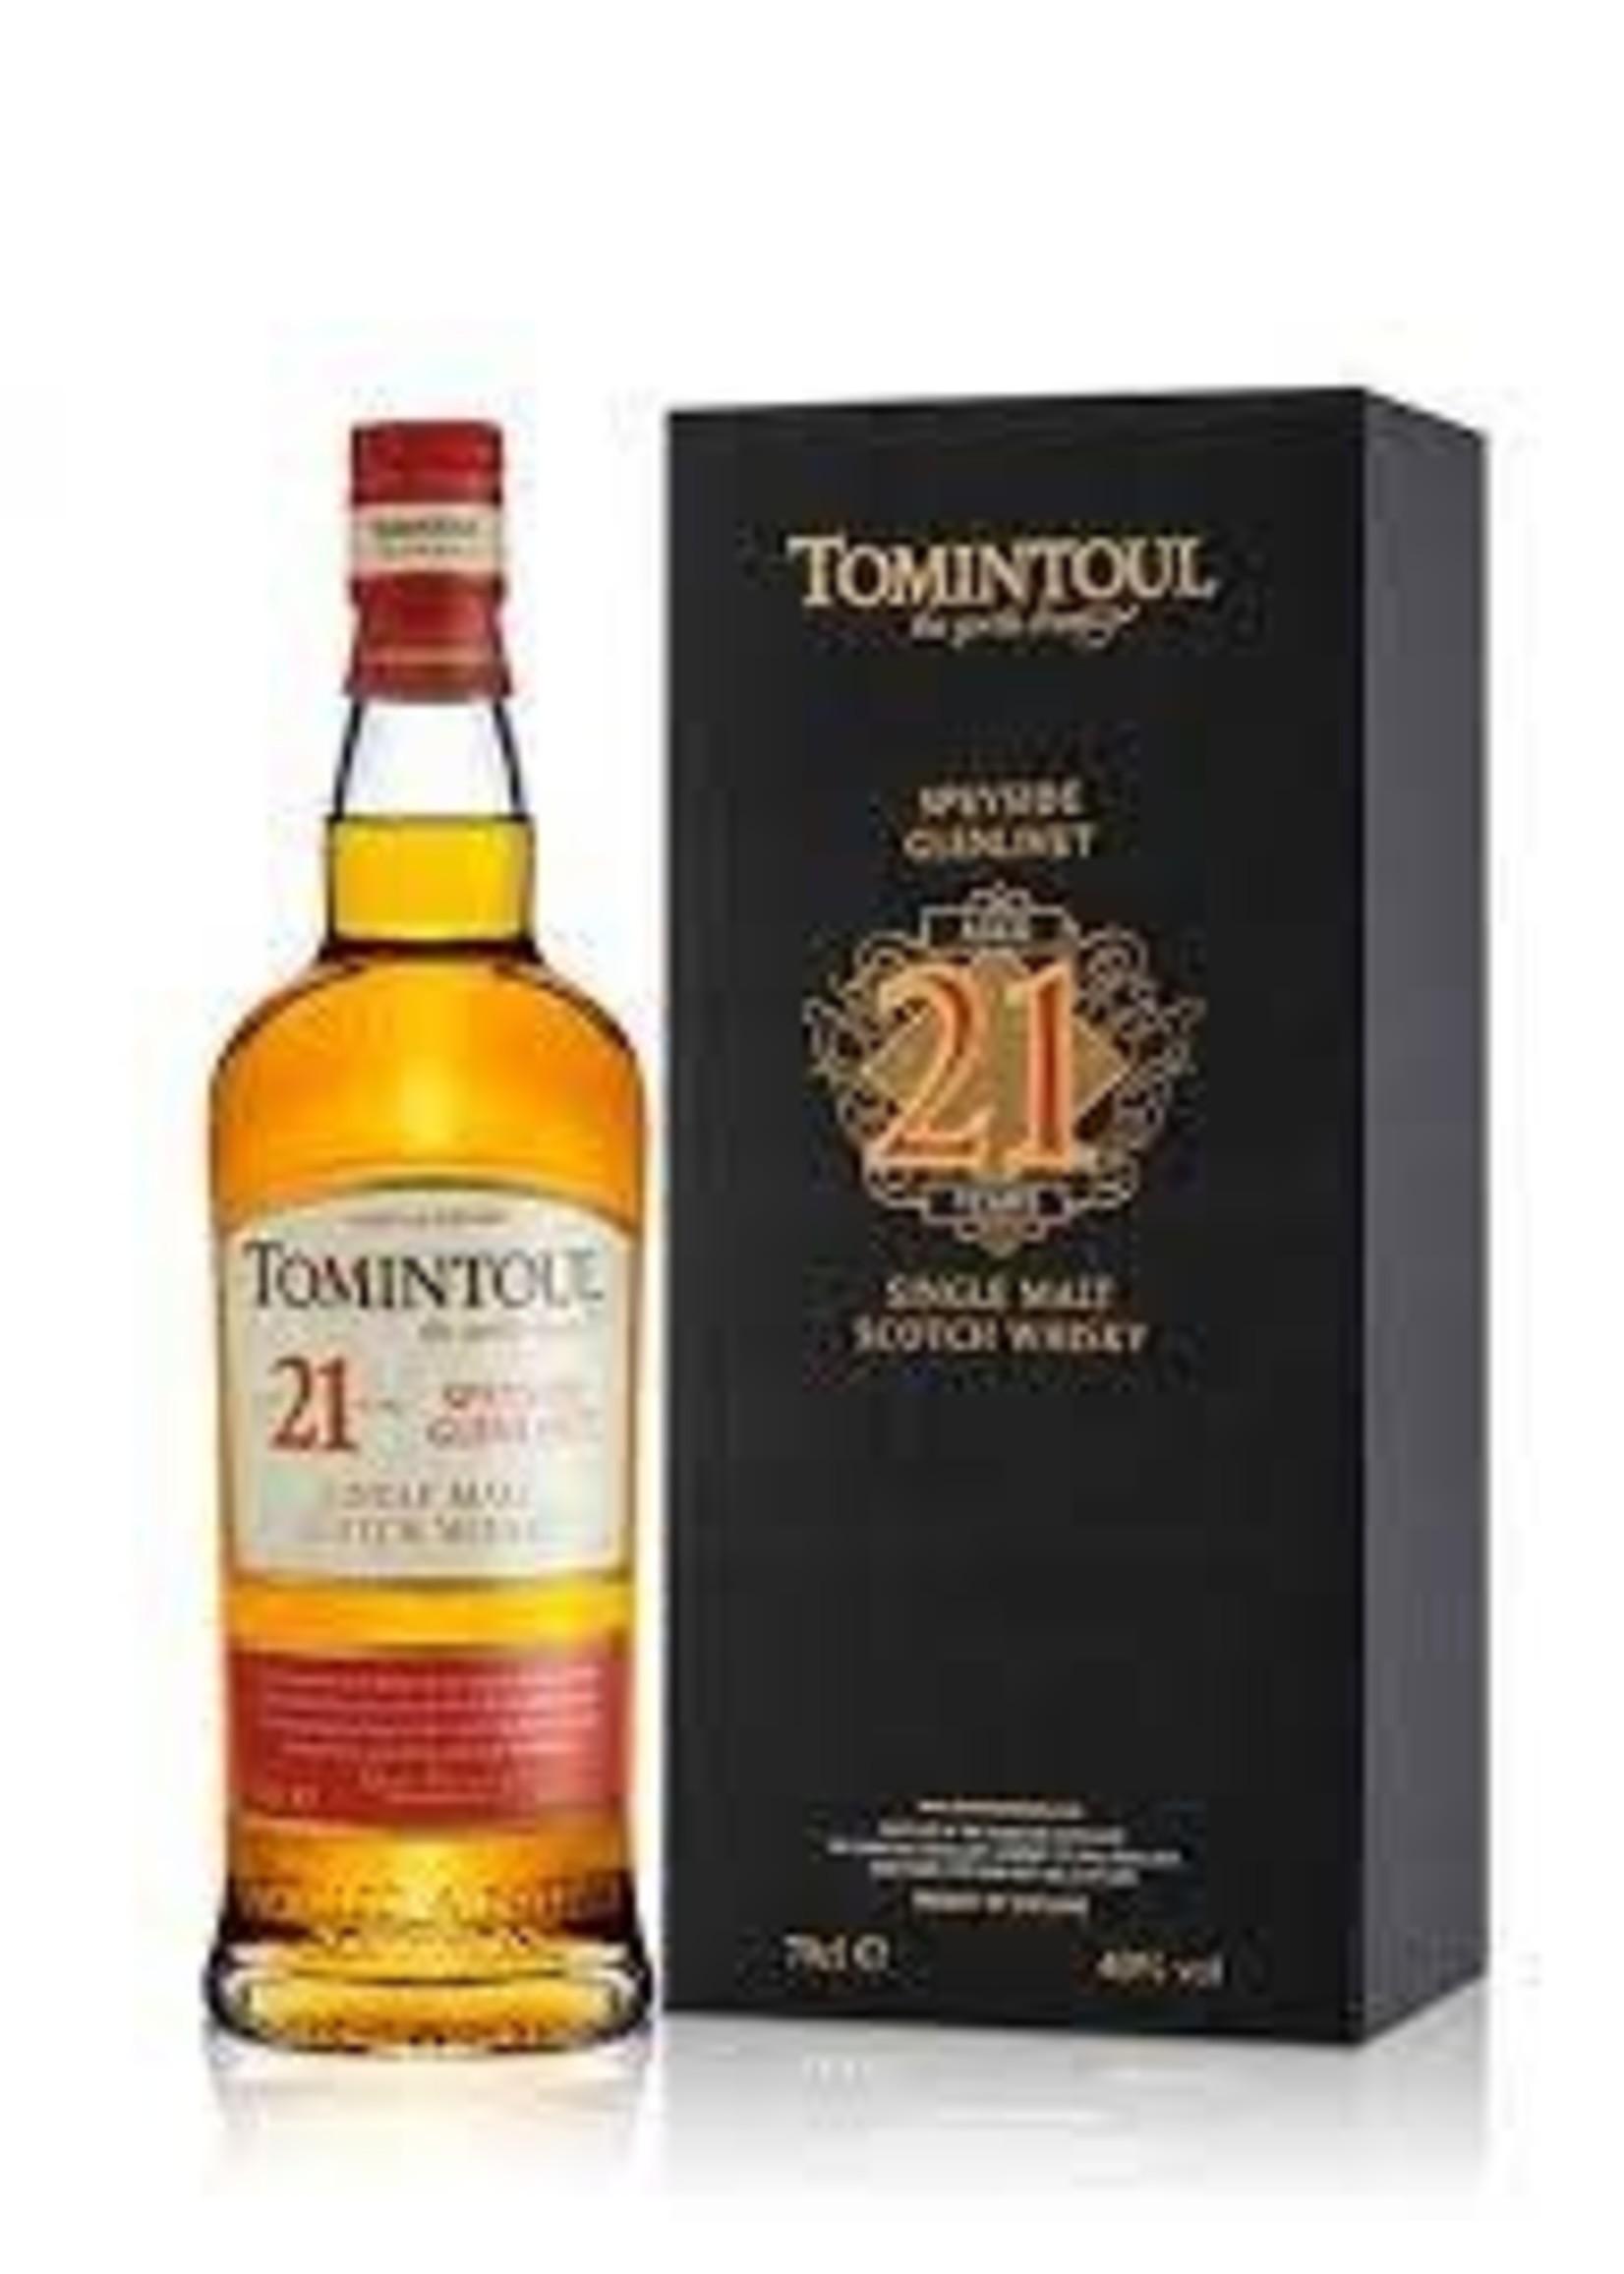 Tomintoul 21 Year Old Speyside Glenlivet Single Malt Scotch Whisky 750ml